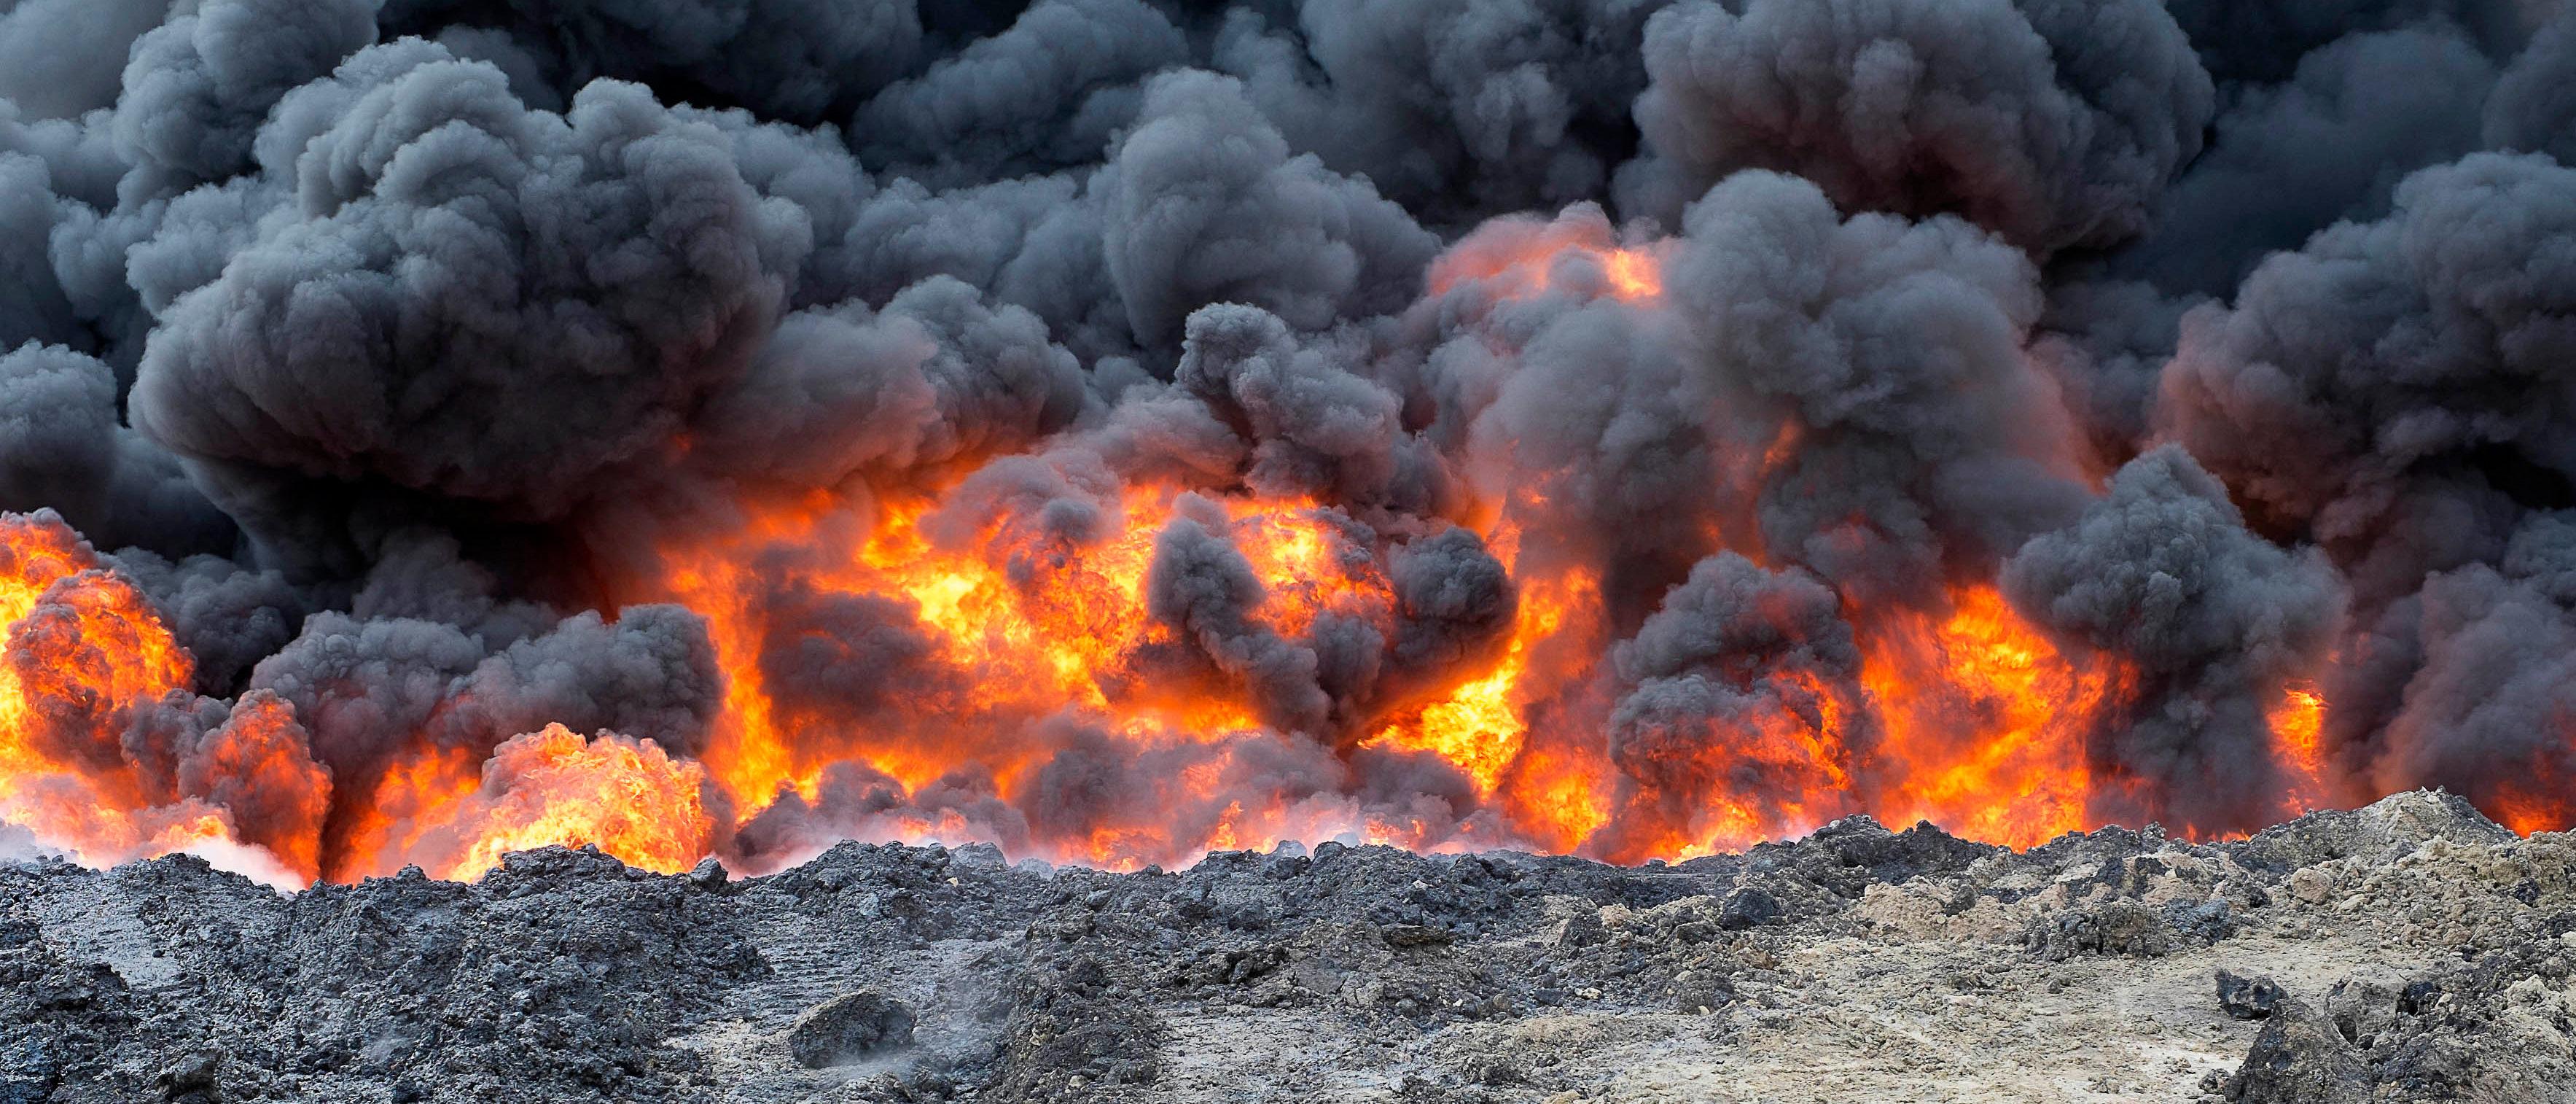 Oil well set fire by ISIS. Shutterstock/cosimoattanasio - Redline